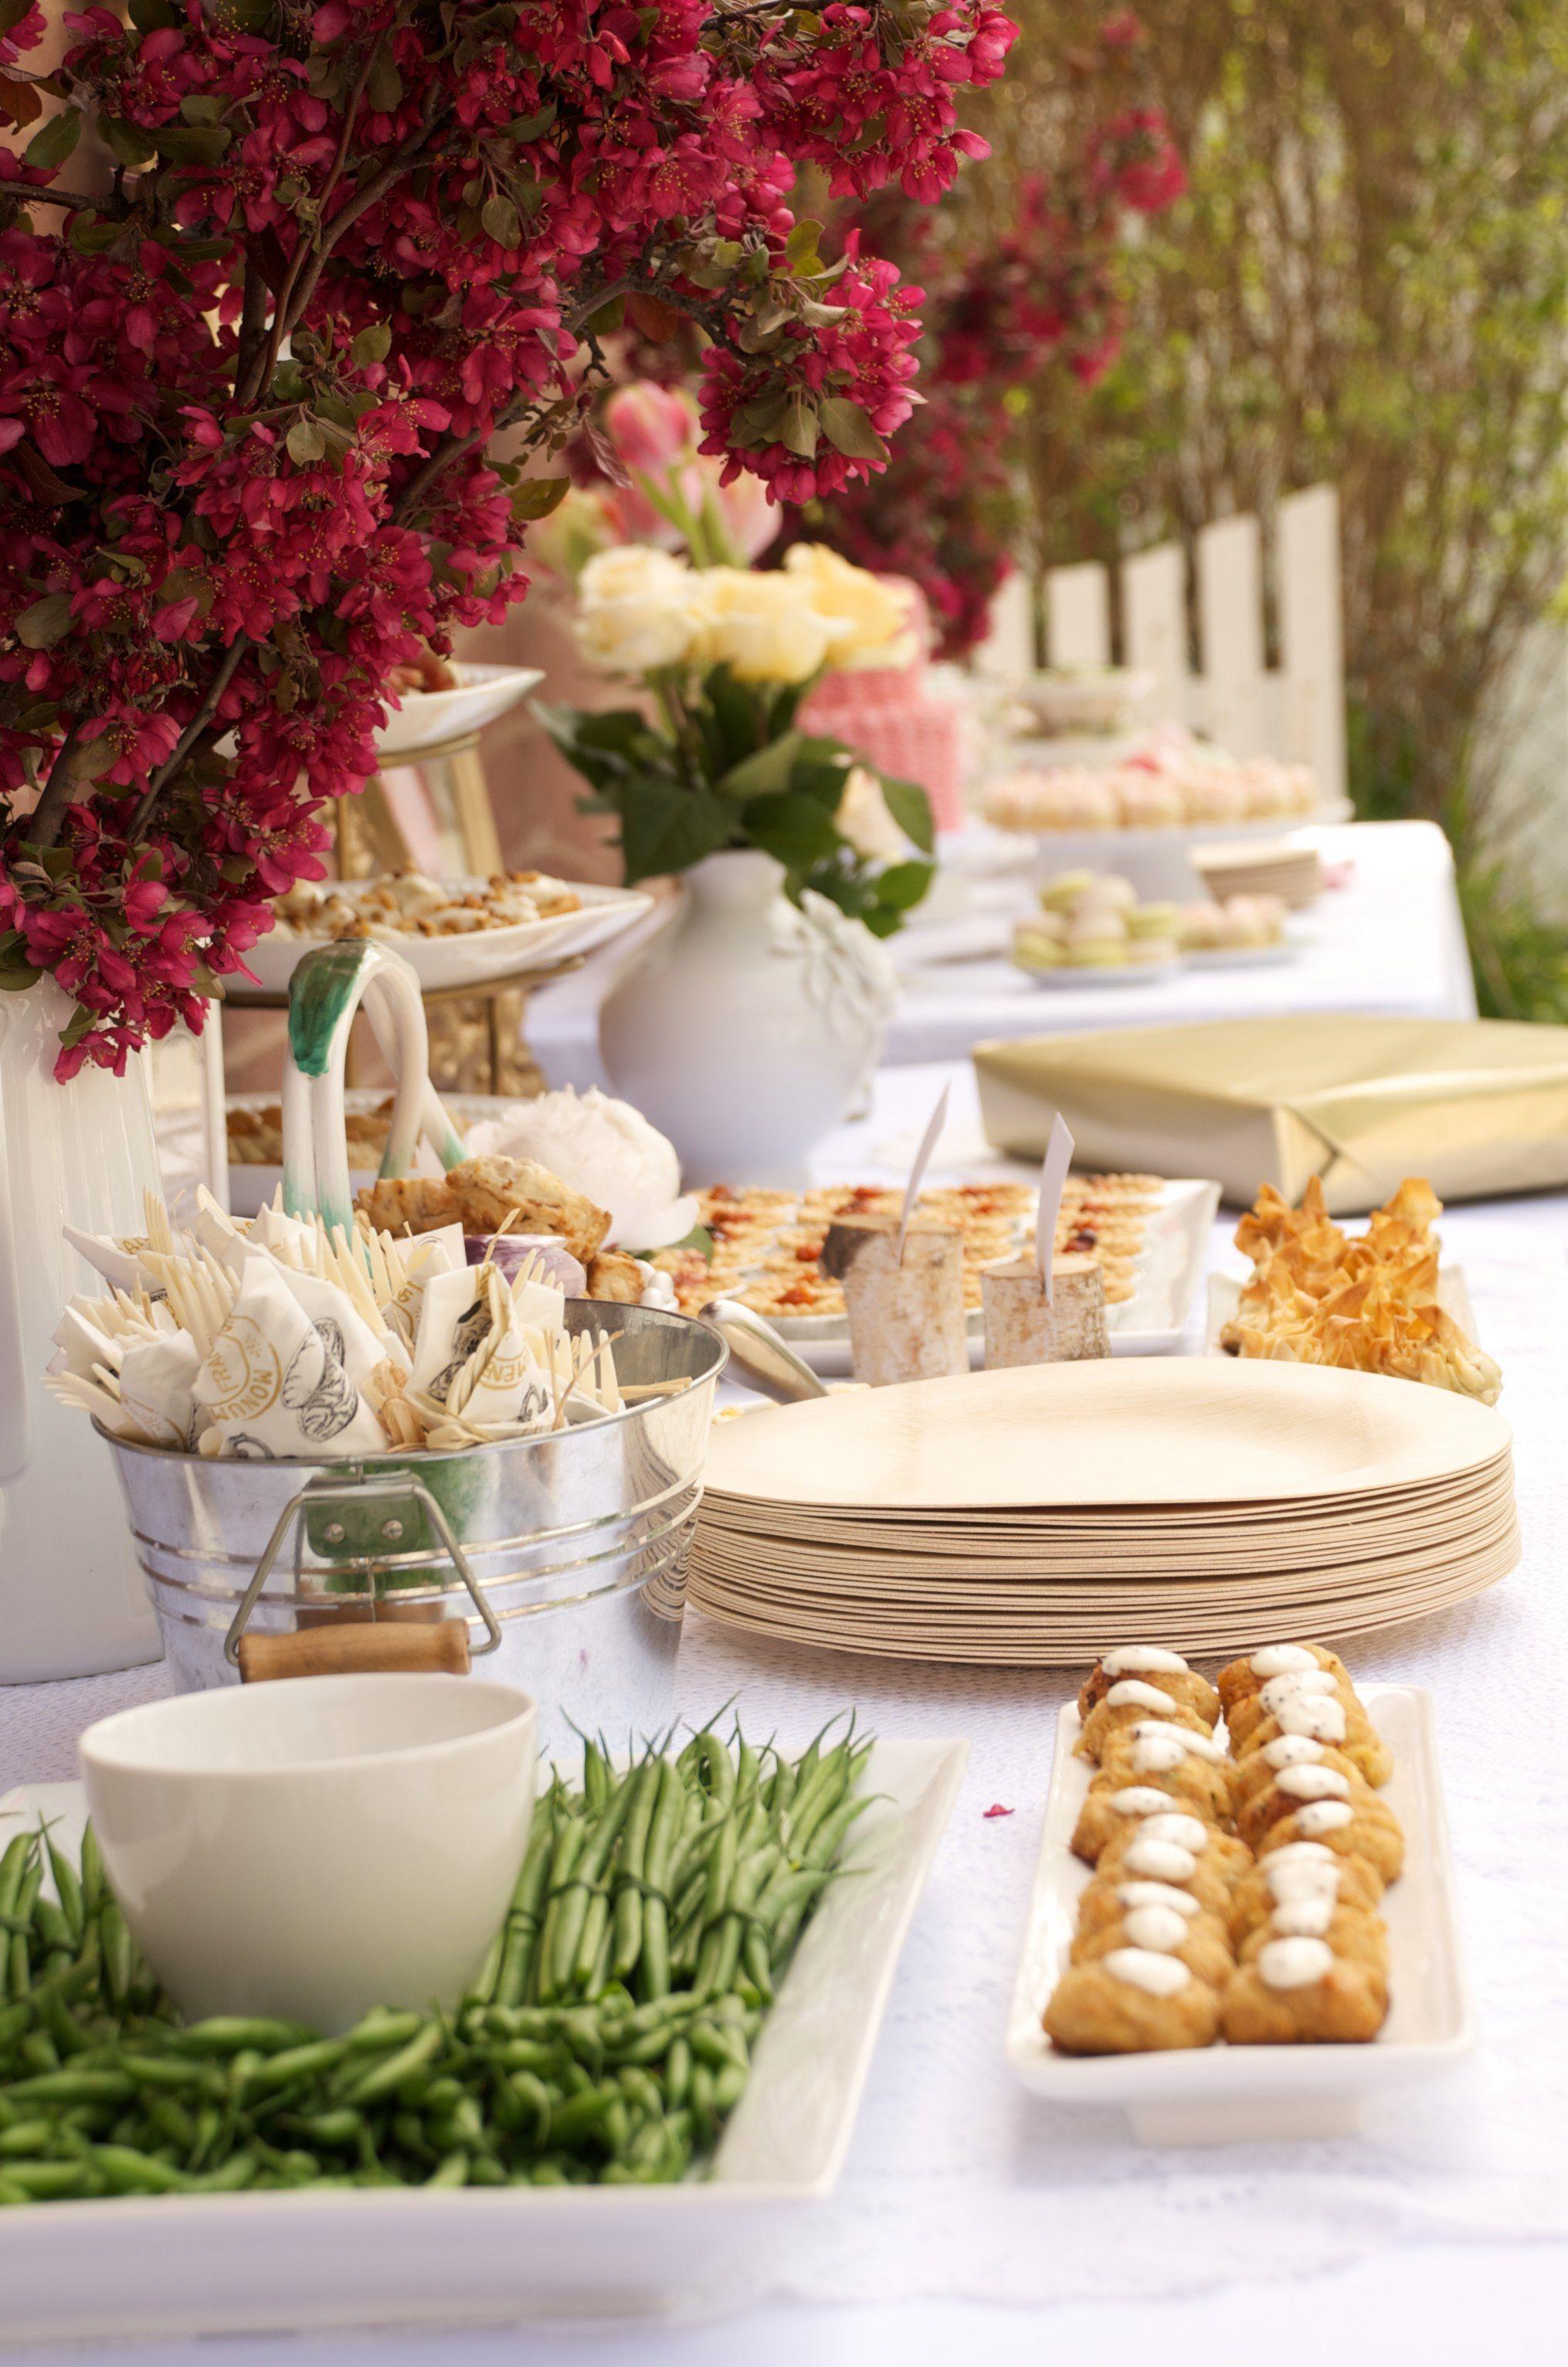 Garden event decor  Pin by Kate Masterson on Event Decor  Pinterest  Buffet